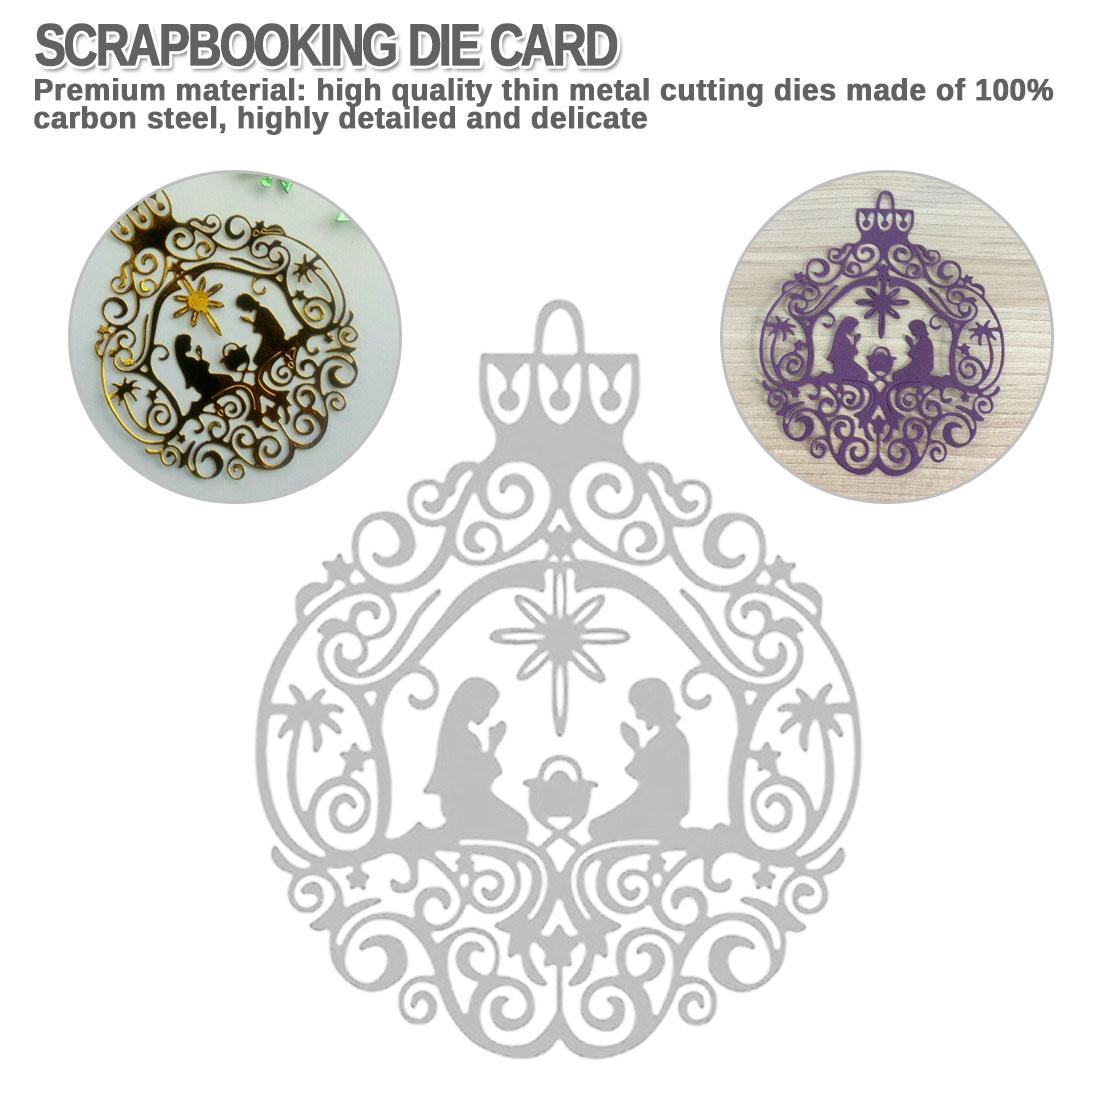 YESZ Cutting Die Silver Tree Metal Cutting Dies DIY Scrapbooking Emboss Paper Cards Making Stencil Mold